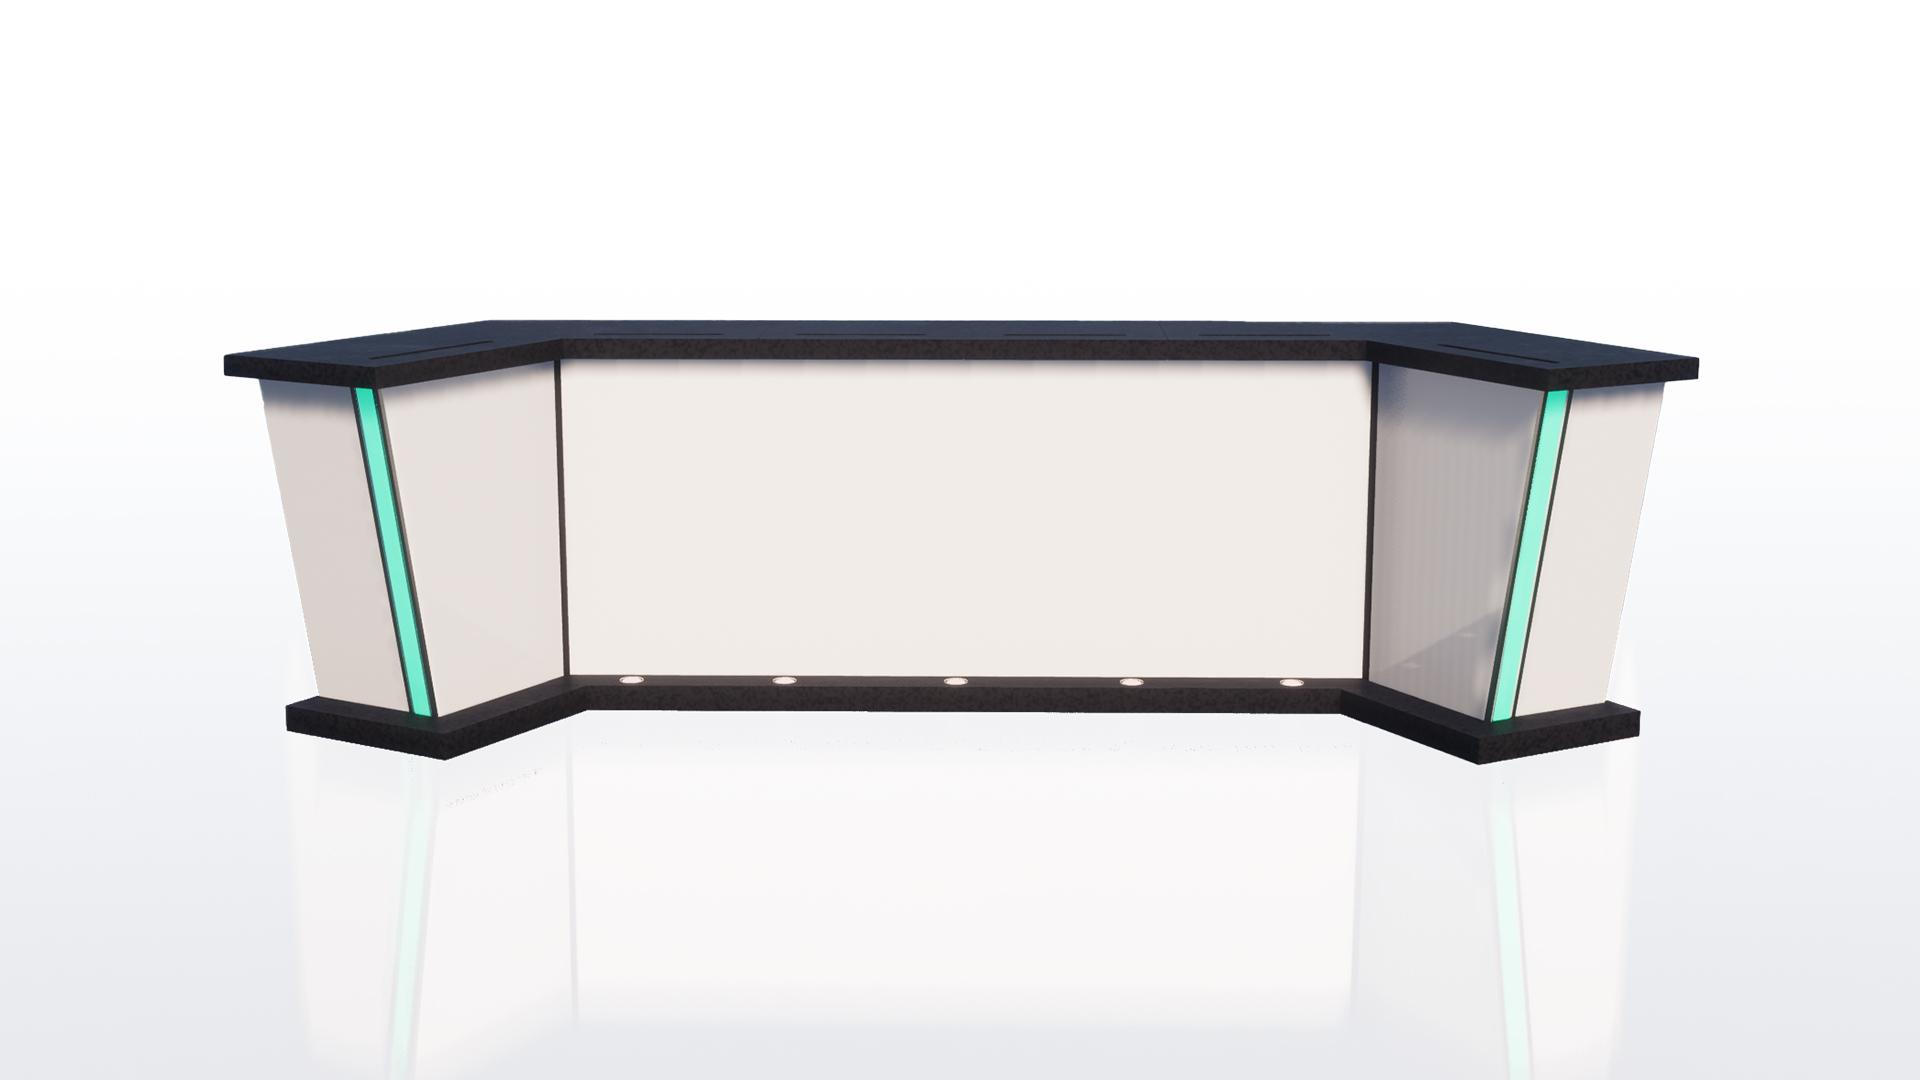 Versa Pro Modular Broadcast Desk